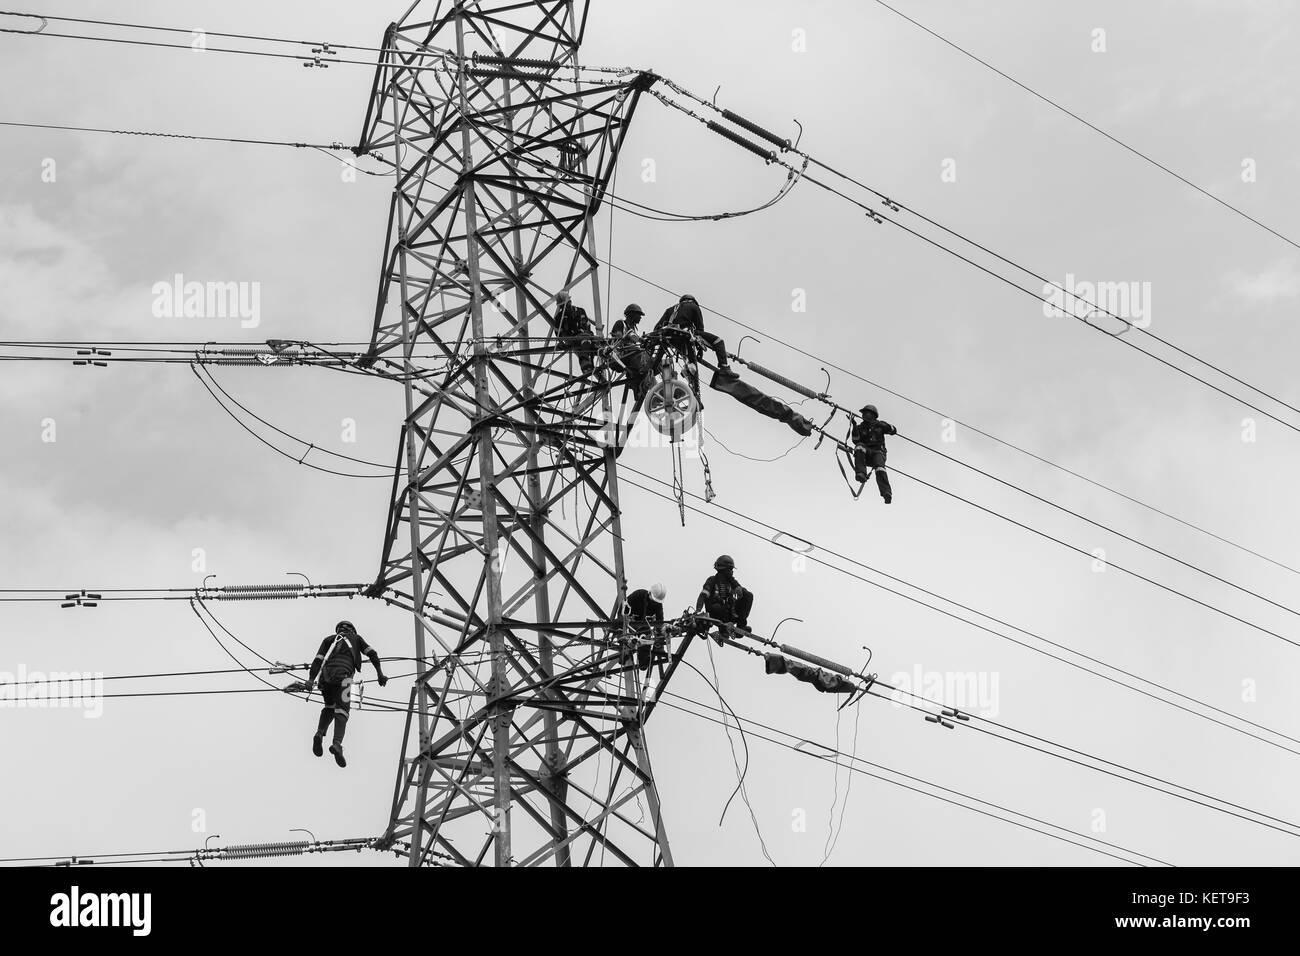 Electricians Stockfotos & Electricians Bilder - Alamy